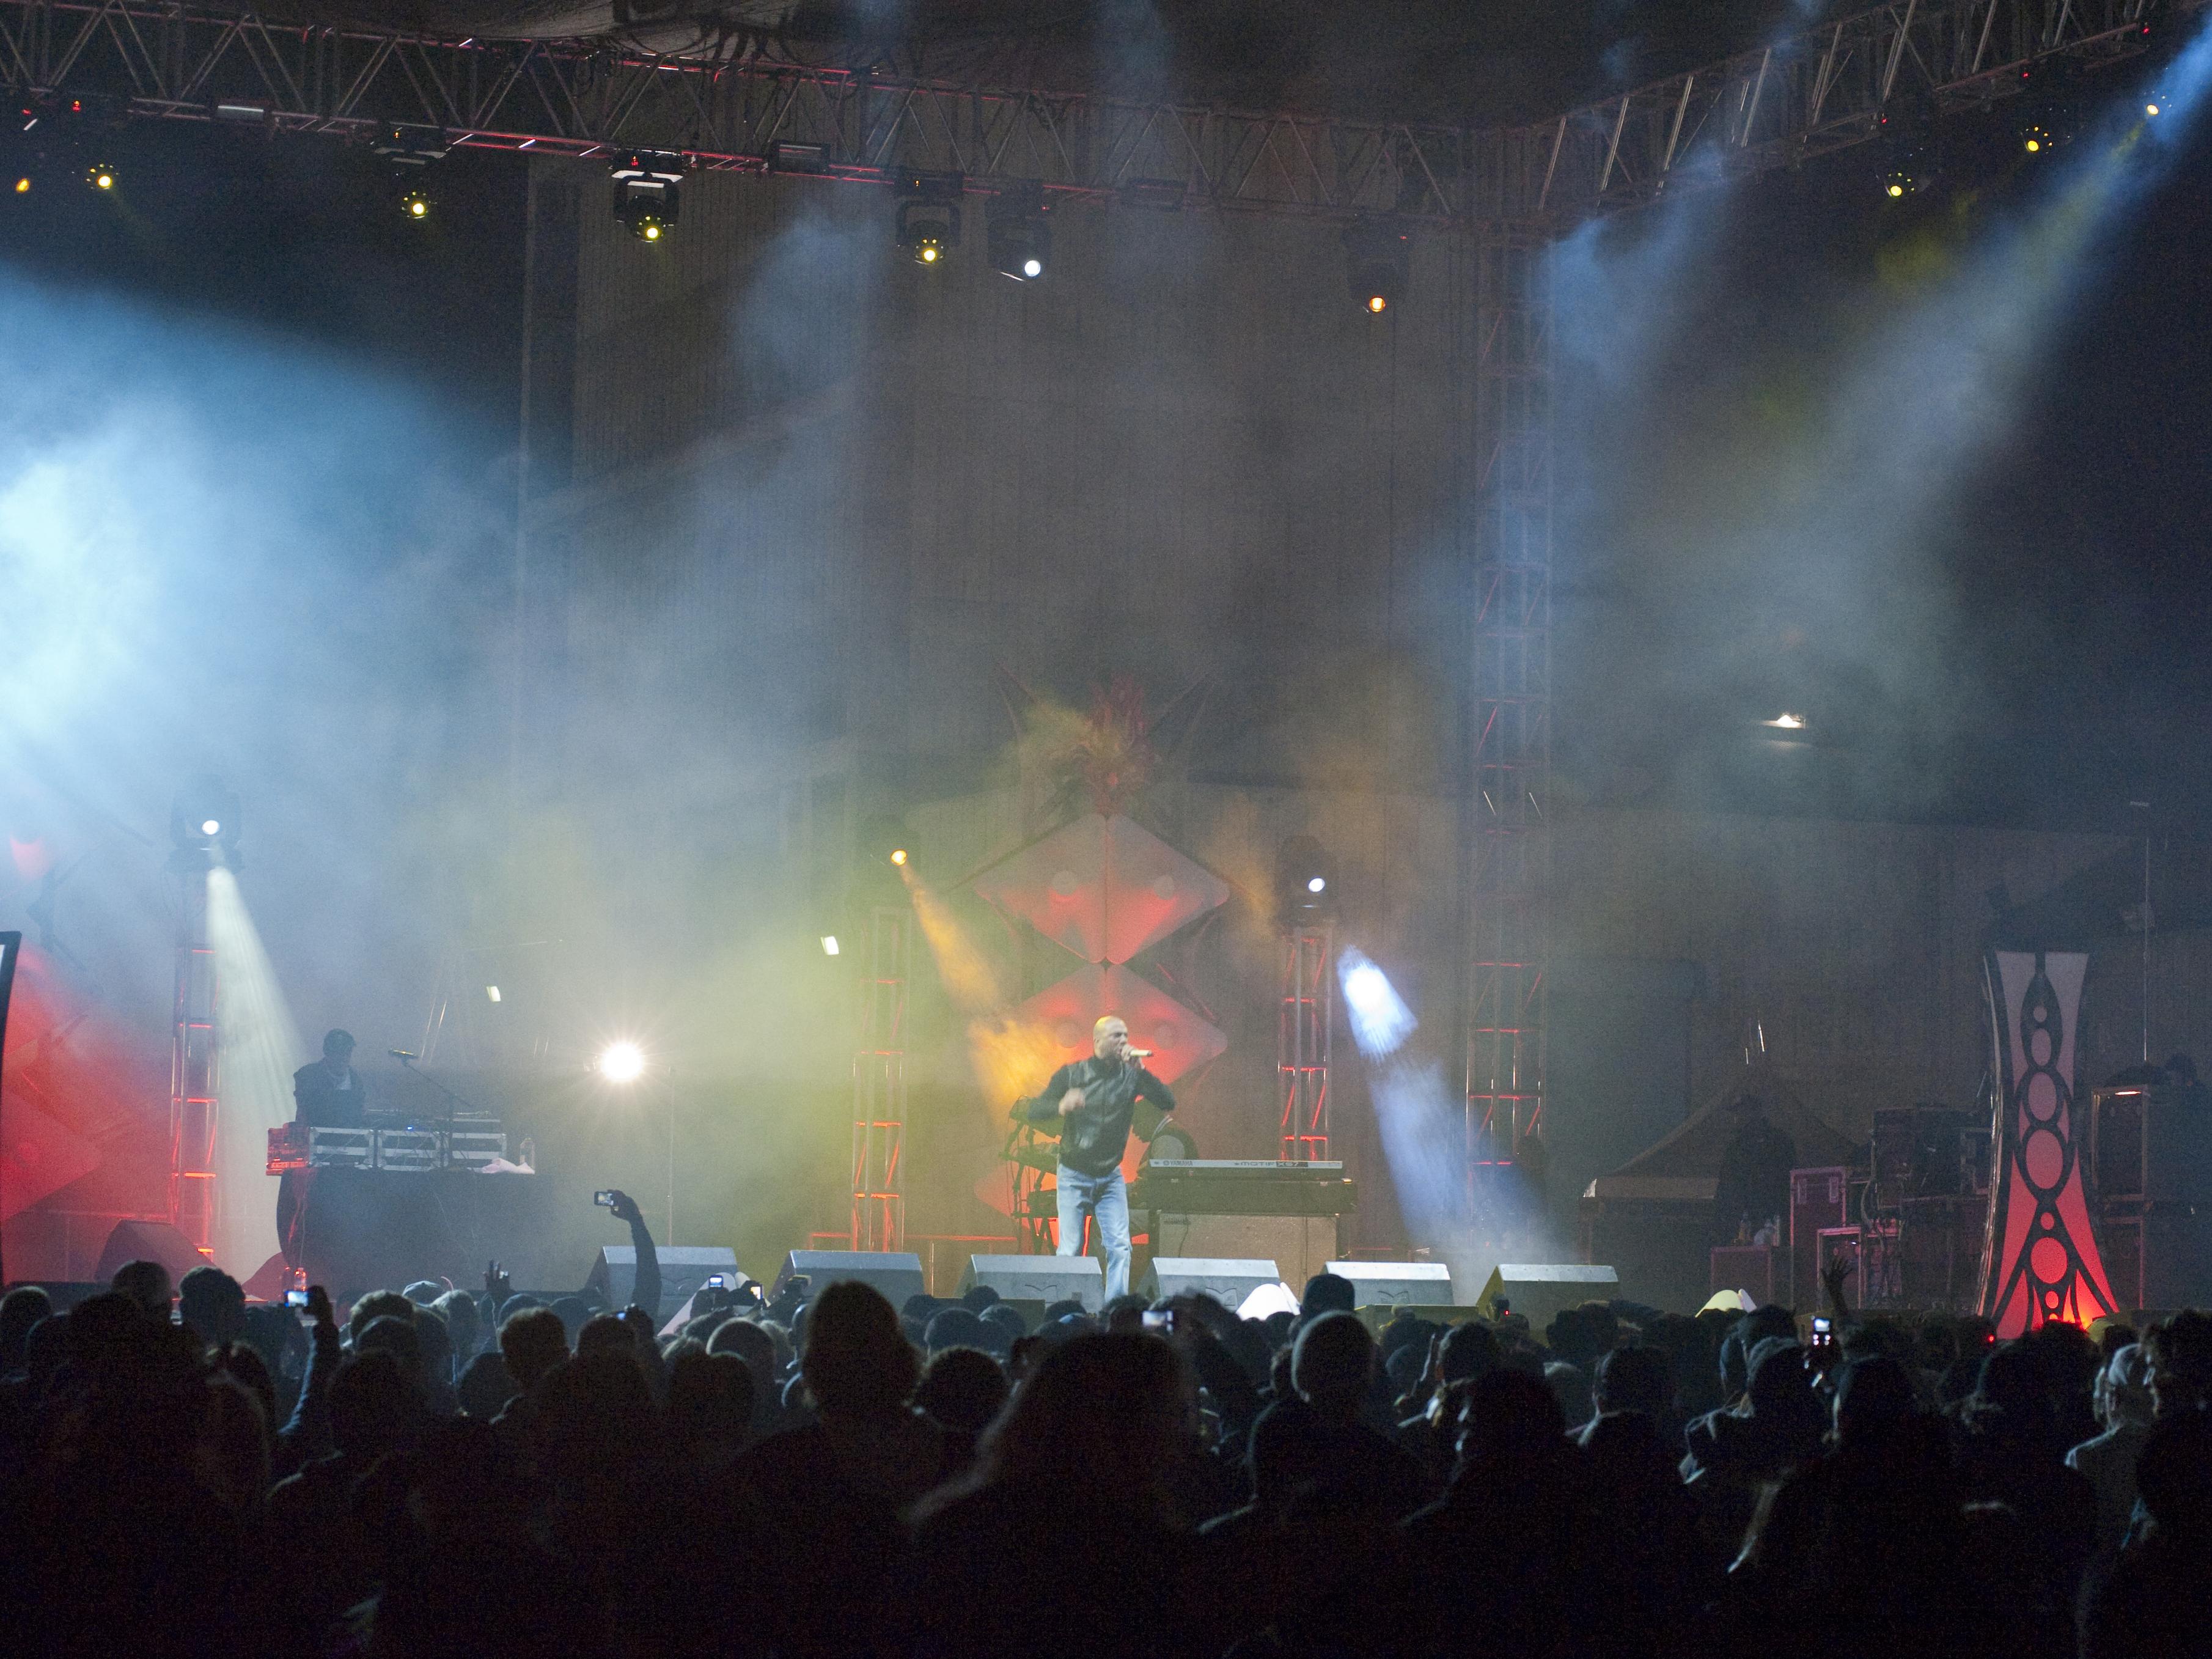 Yuri concert night danza de la luna 2016 3